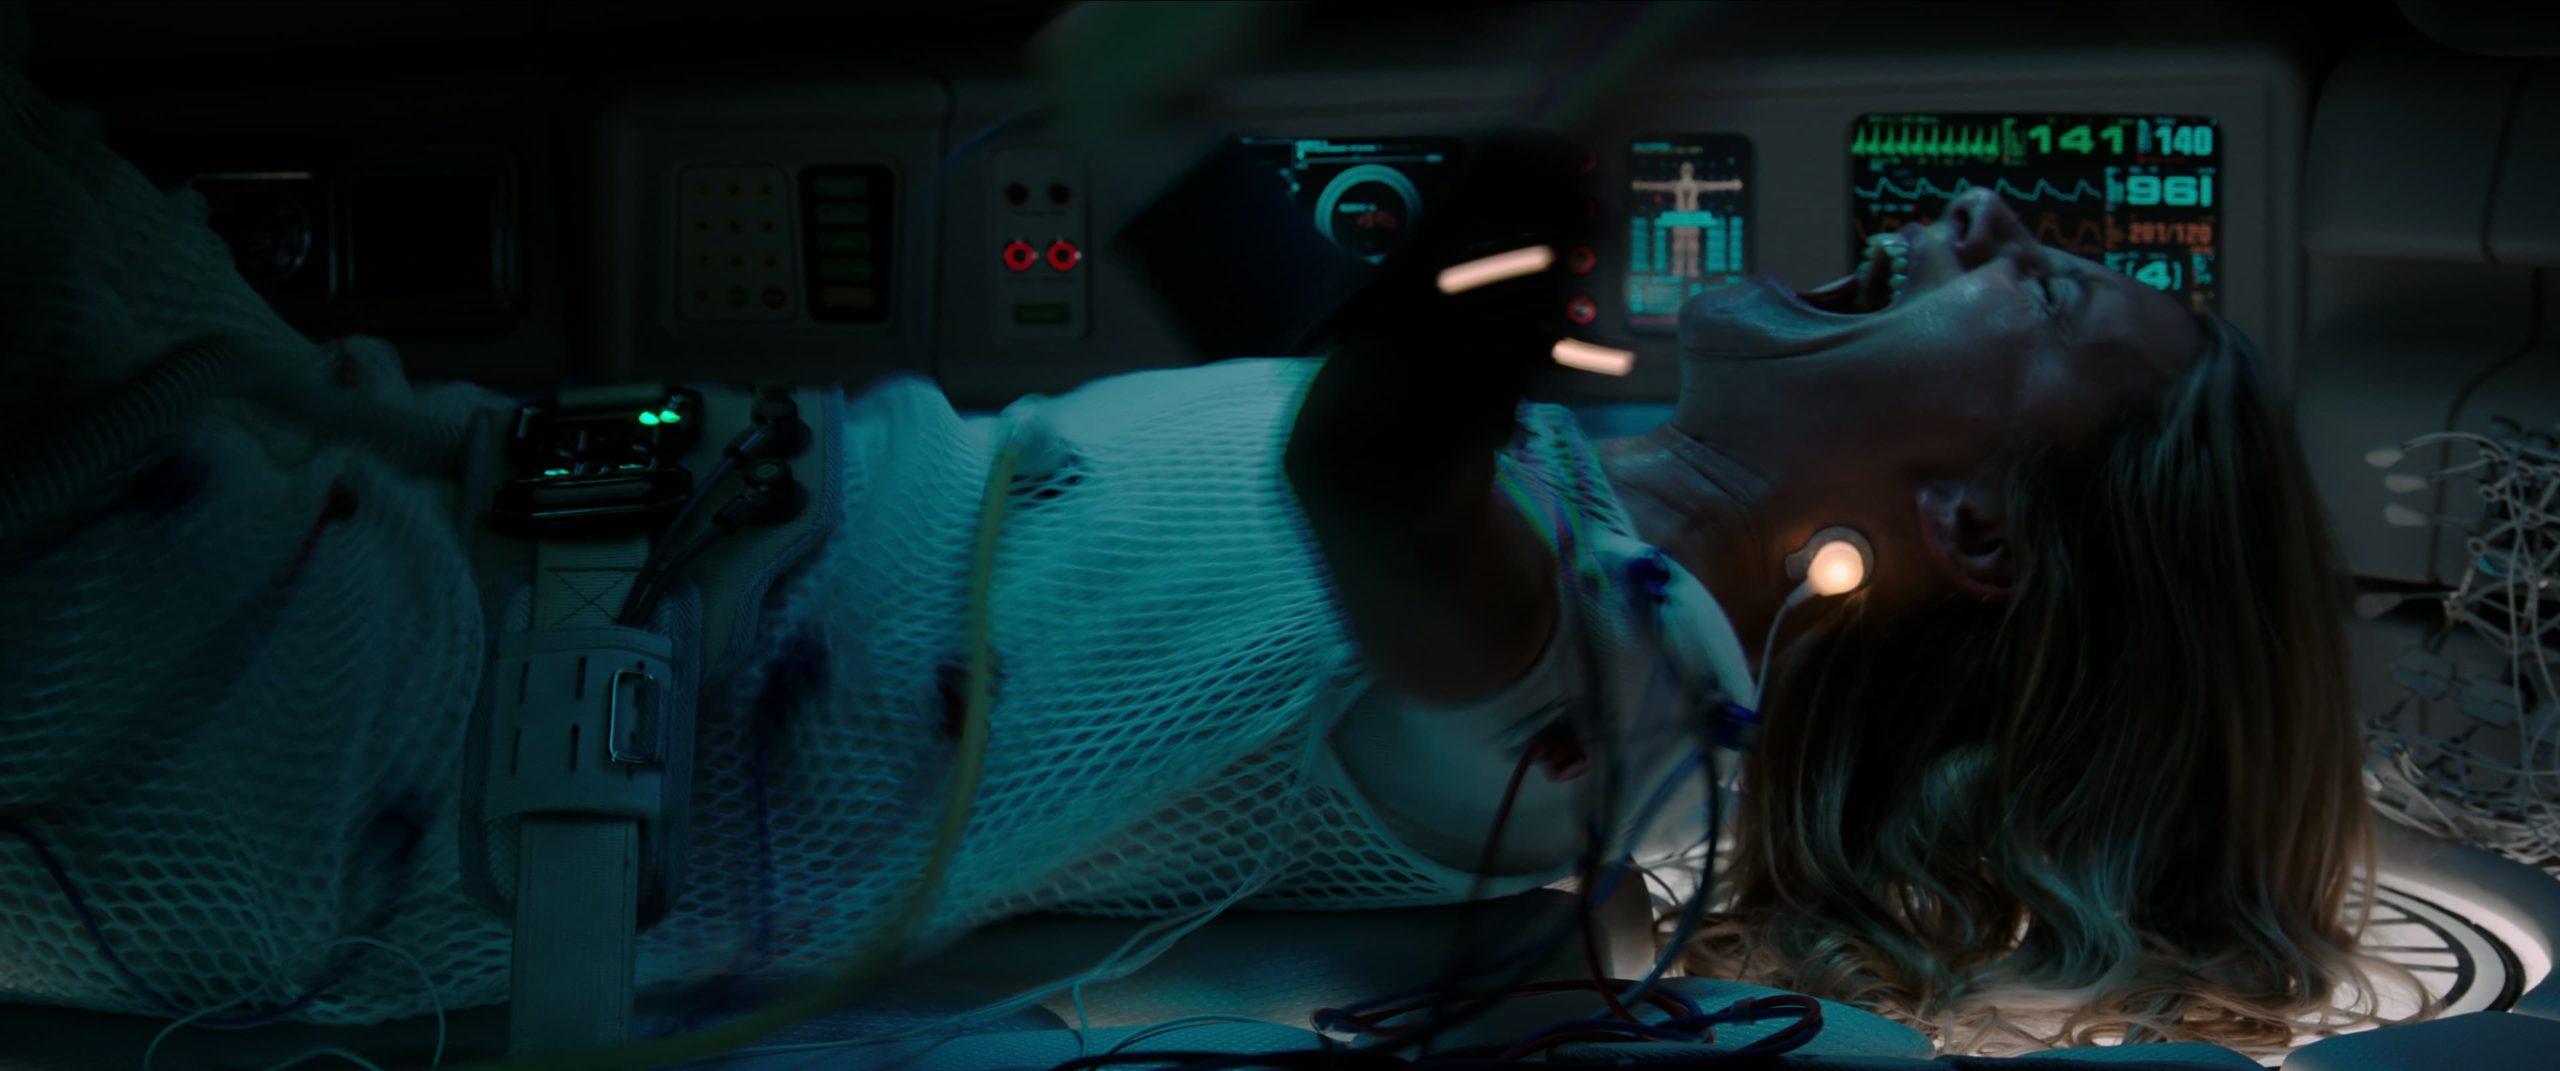 Oxygen Netflix Movie Review